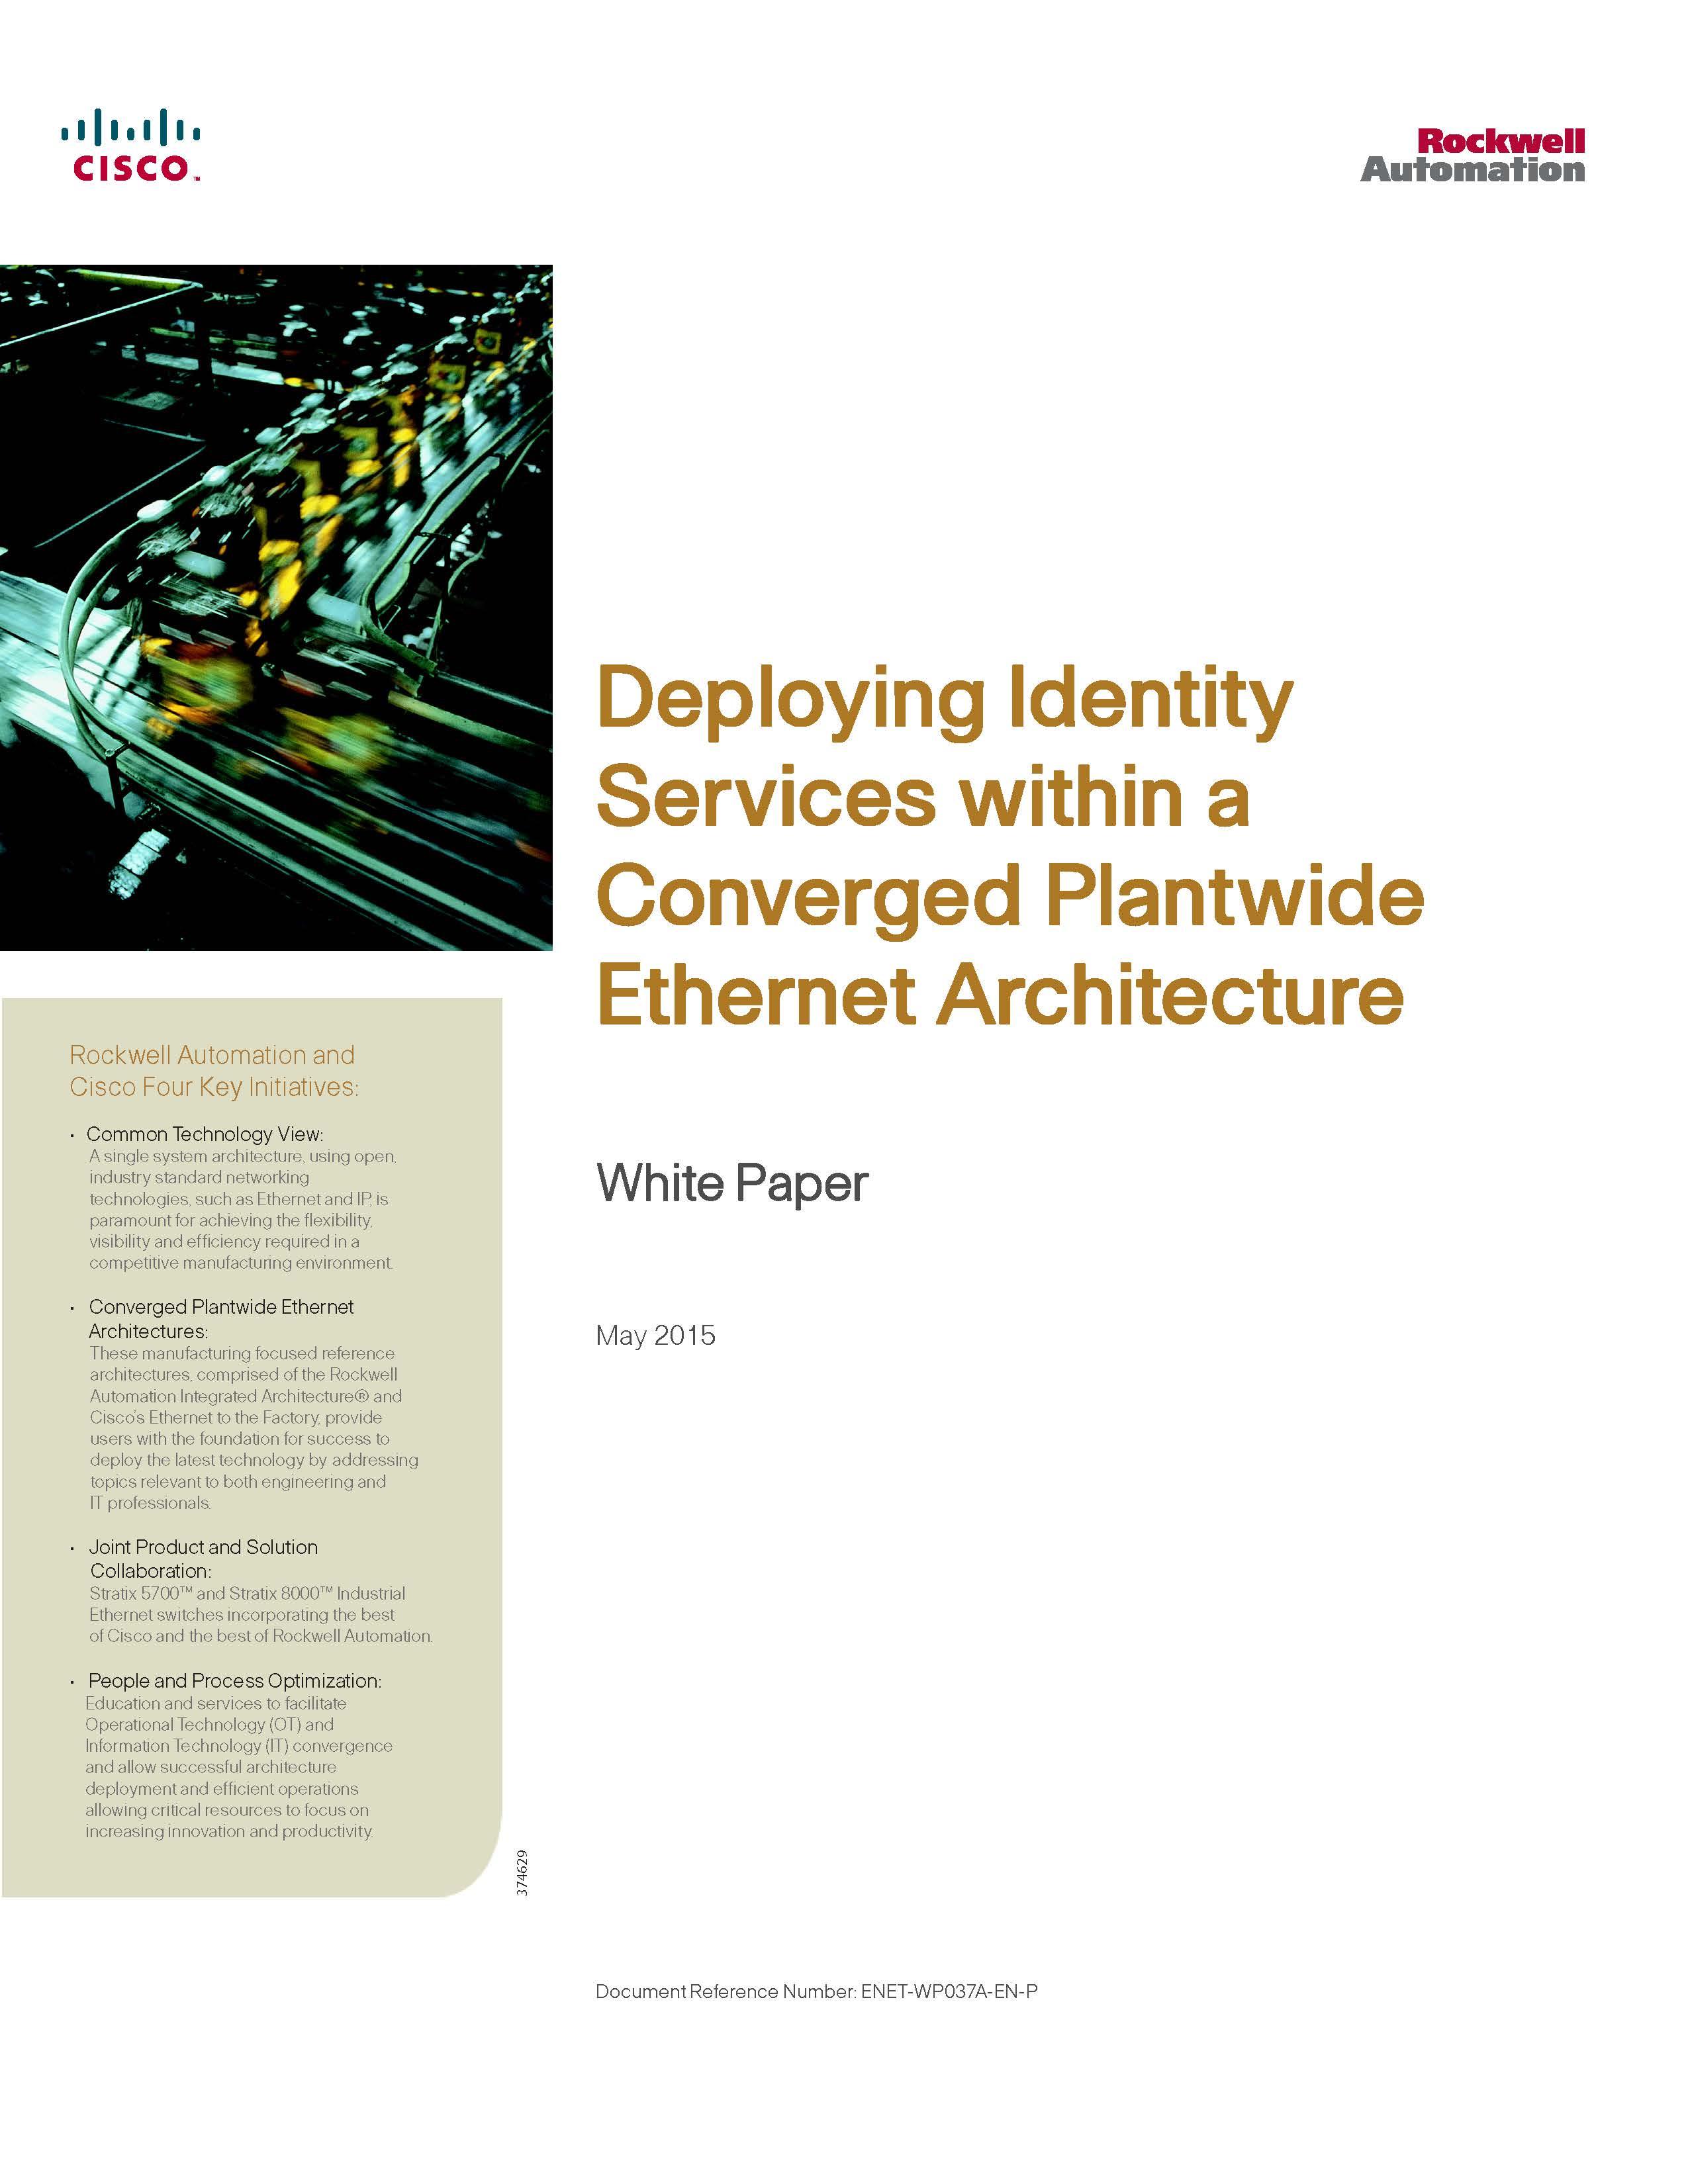 Cisco Rockwell Automatio identity services white paper